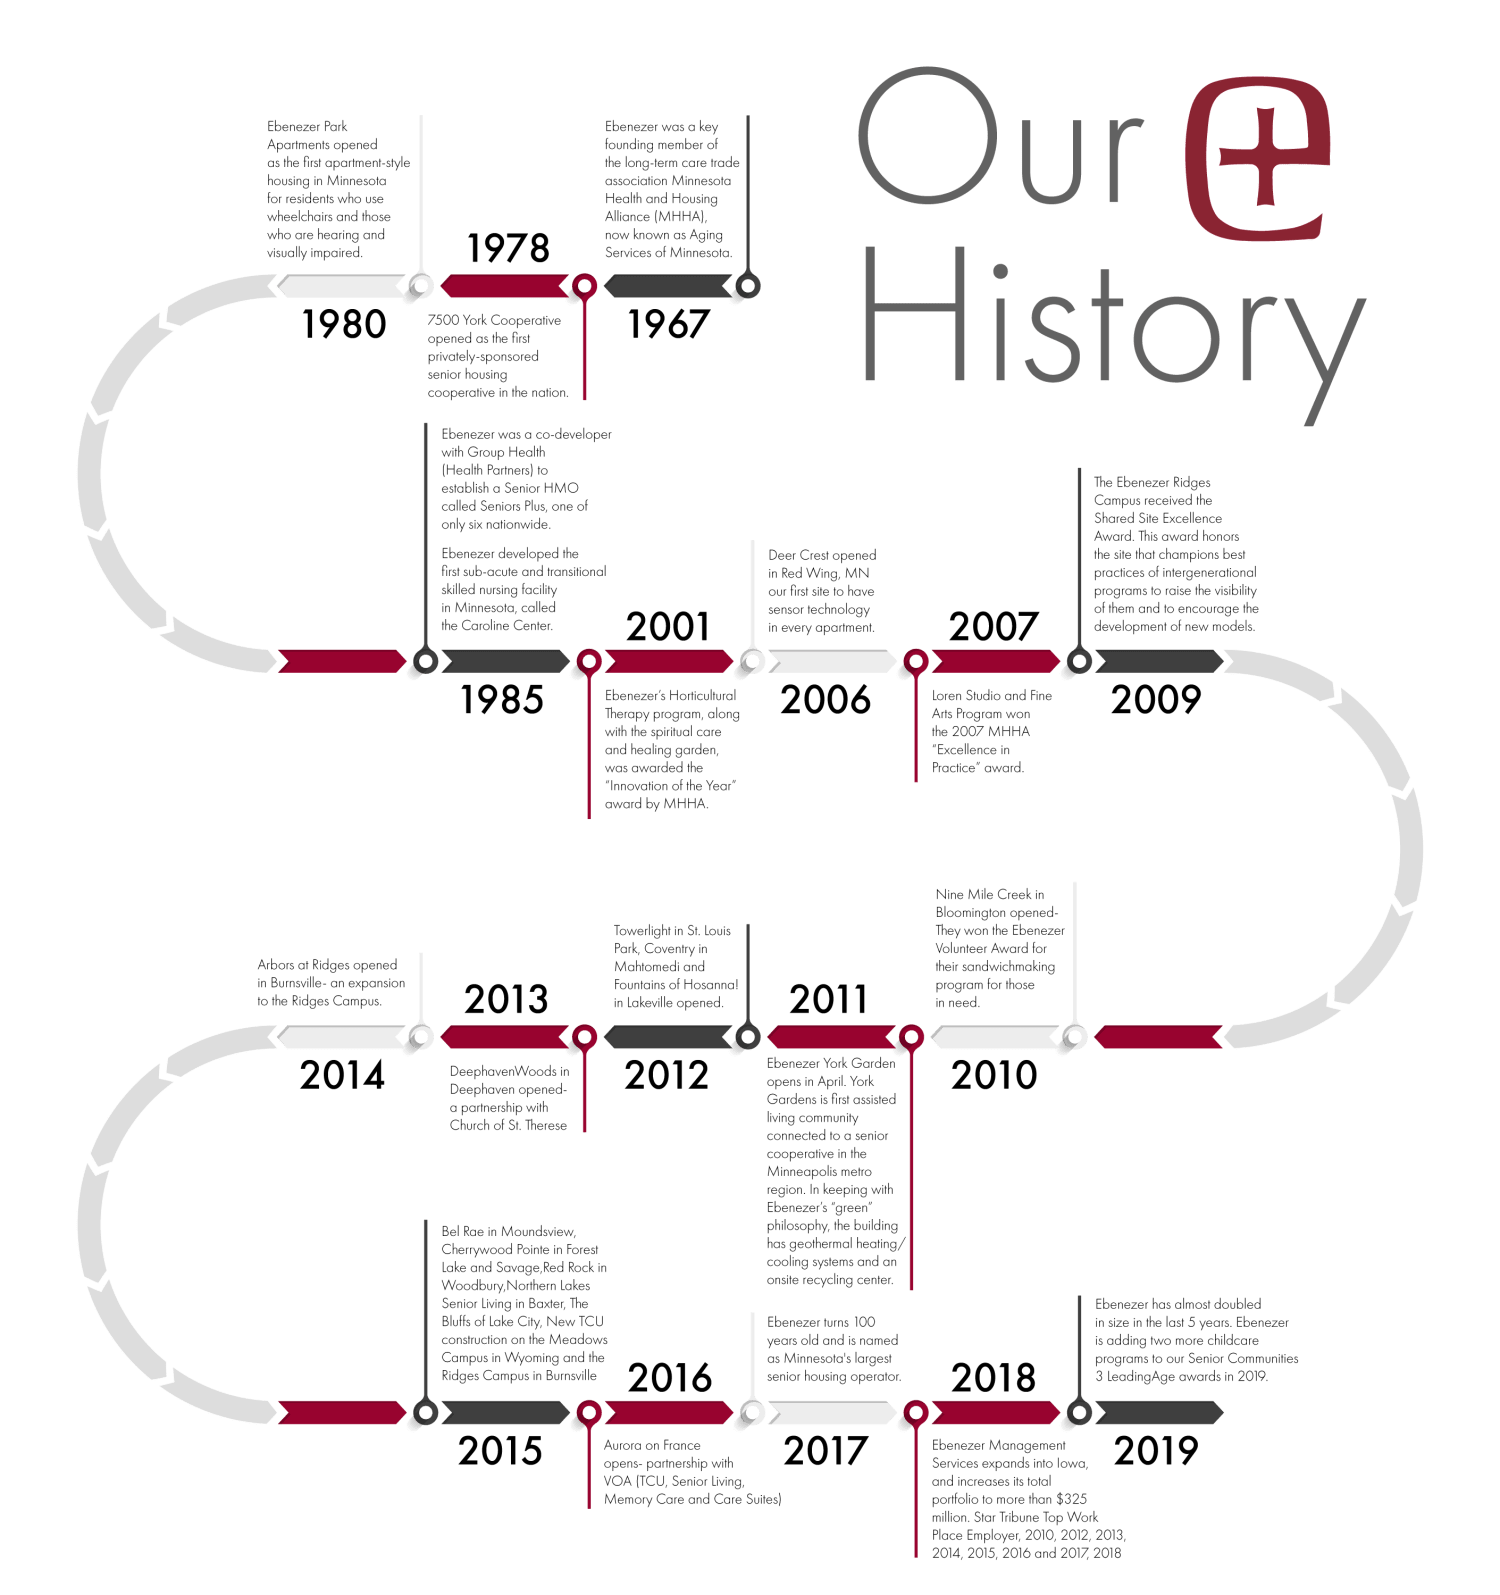 Timeline of events in Ebenezer Senior Living history